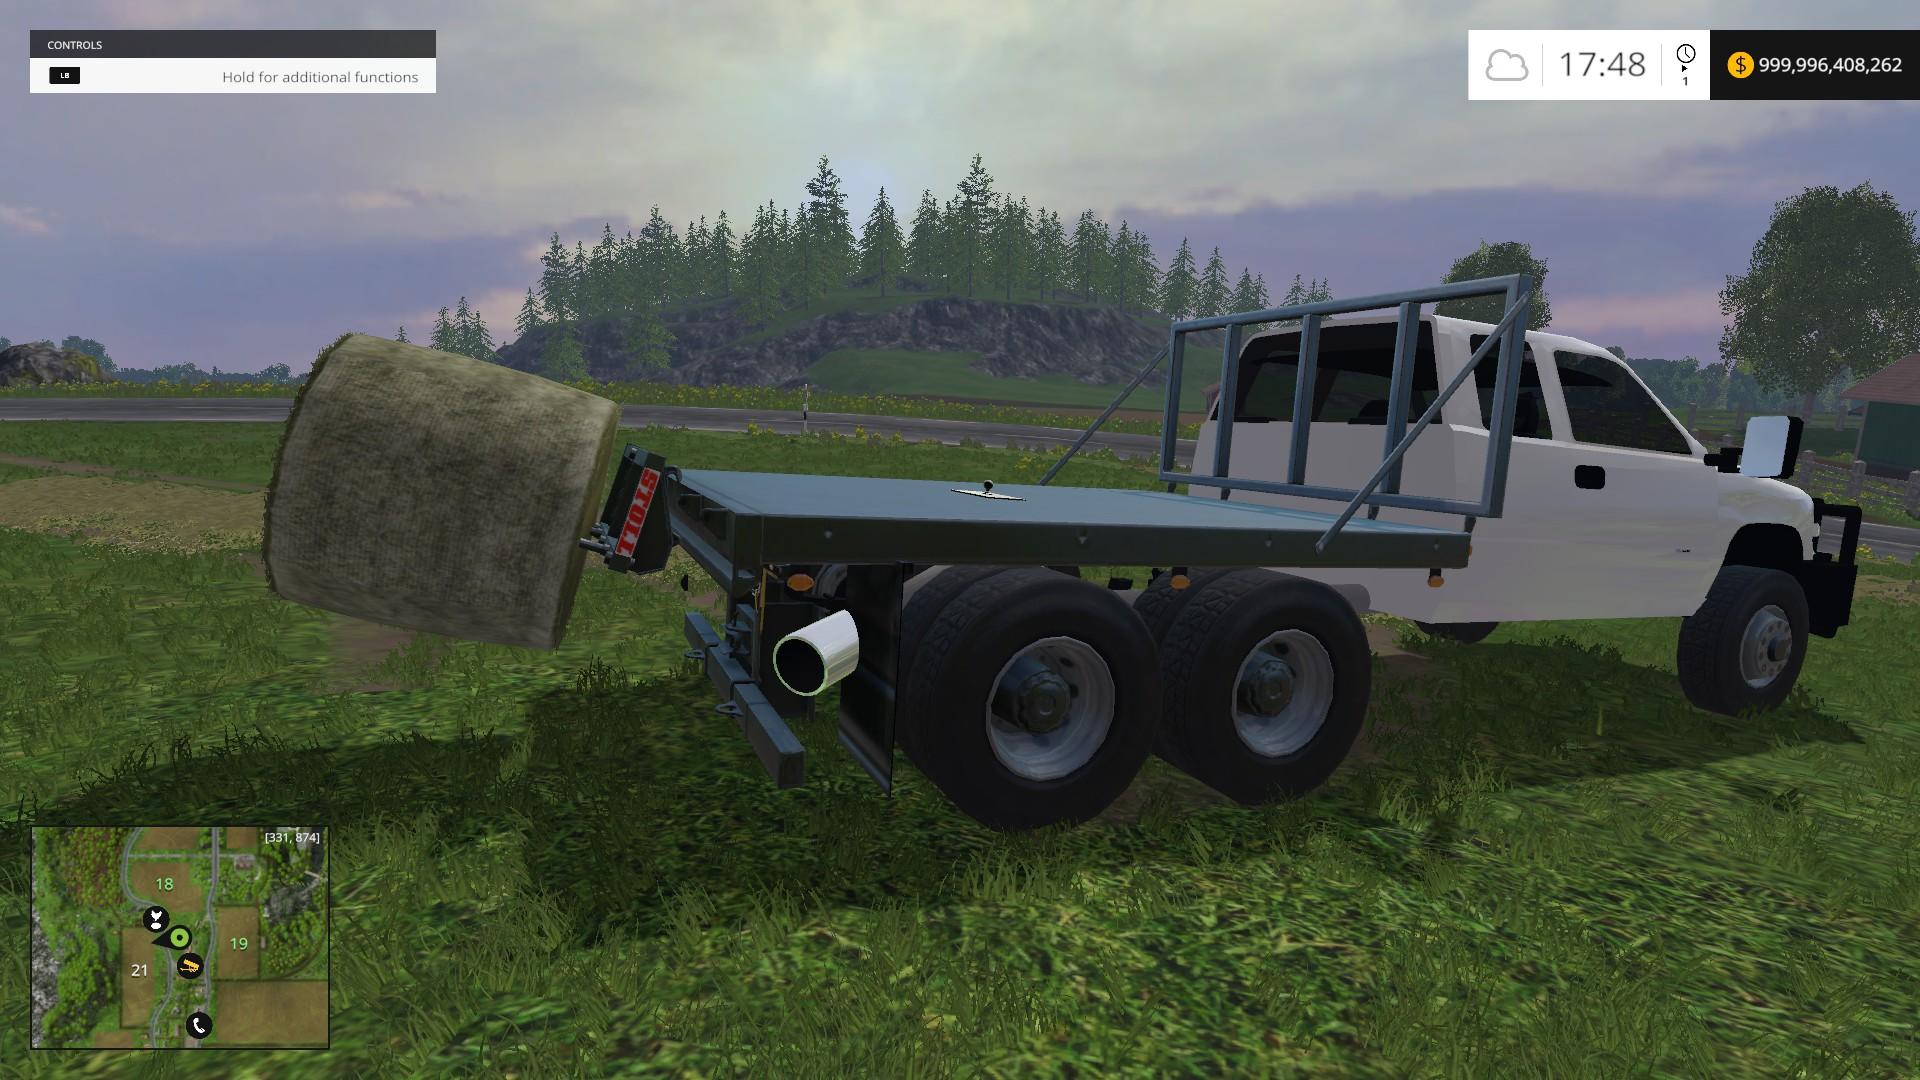 Duramax Flatbed Updated for FS 15 - Farming simulator 2015 / 15 LS mod